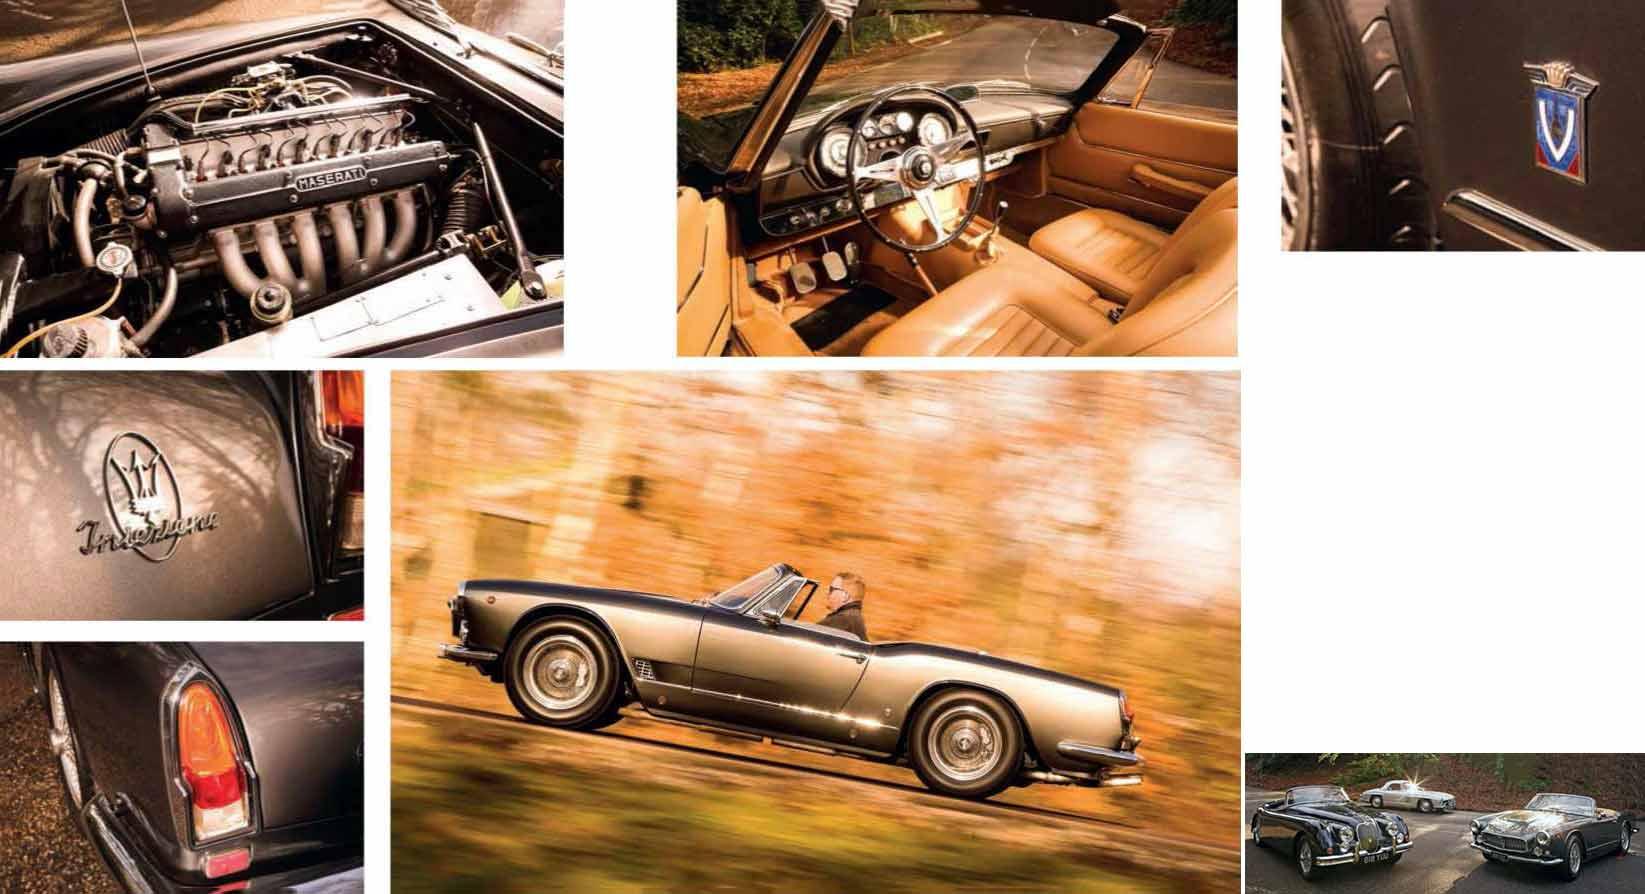 1959 Maserati 3500GT Spyder